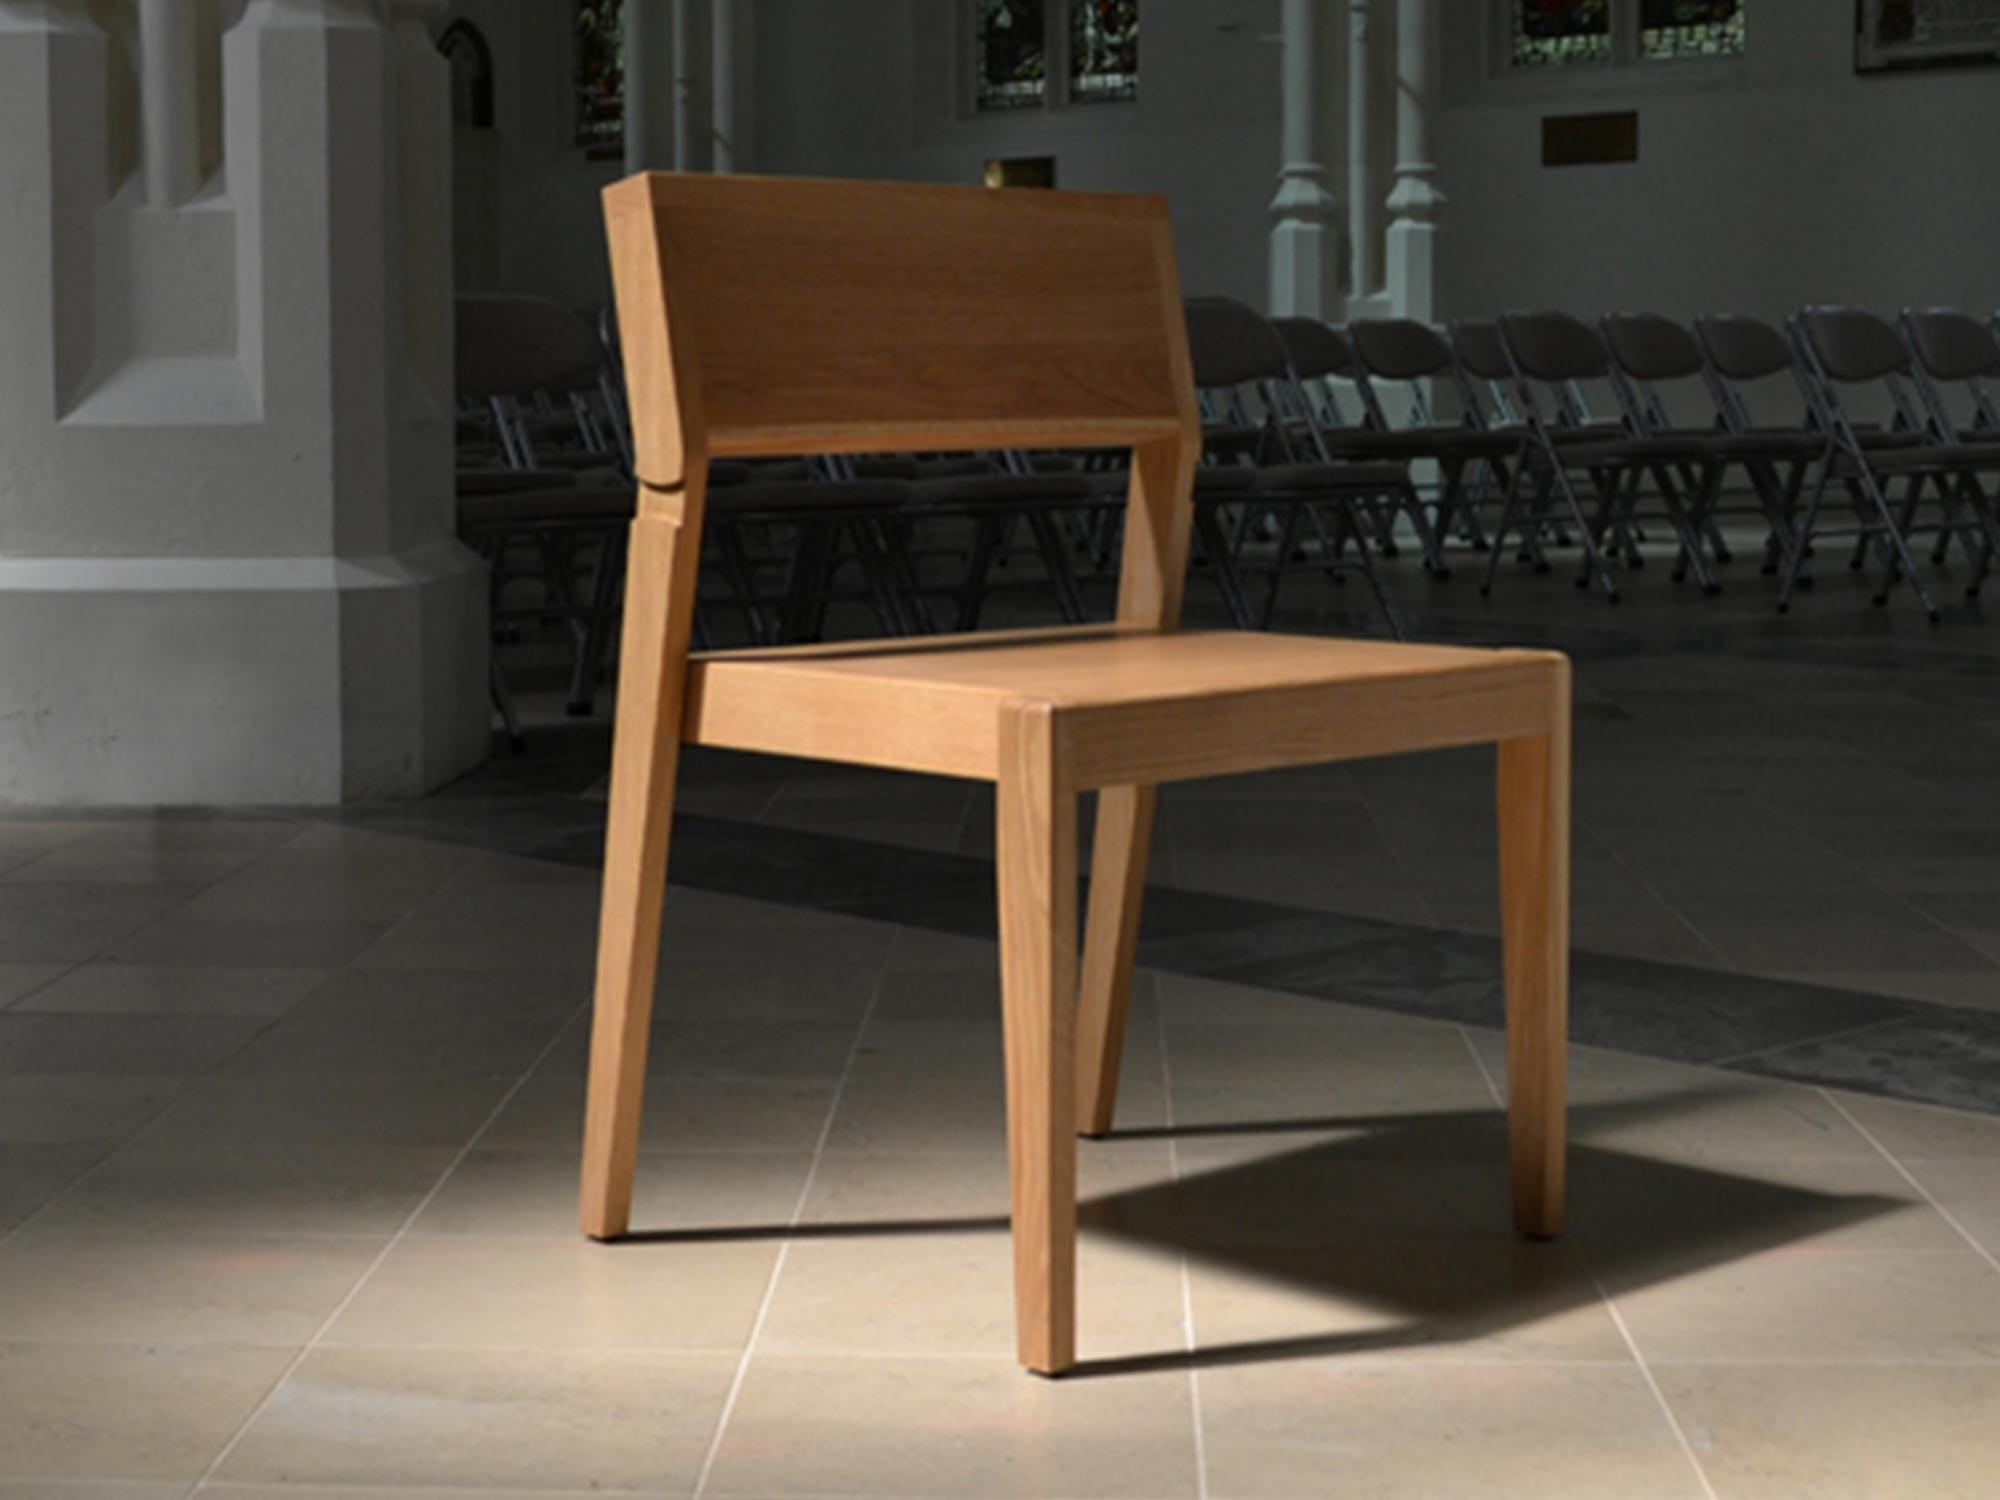 chair design competition 2017 aluminum web lawn chairs church maynard